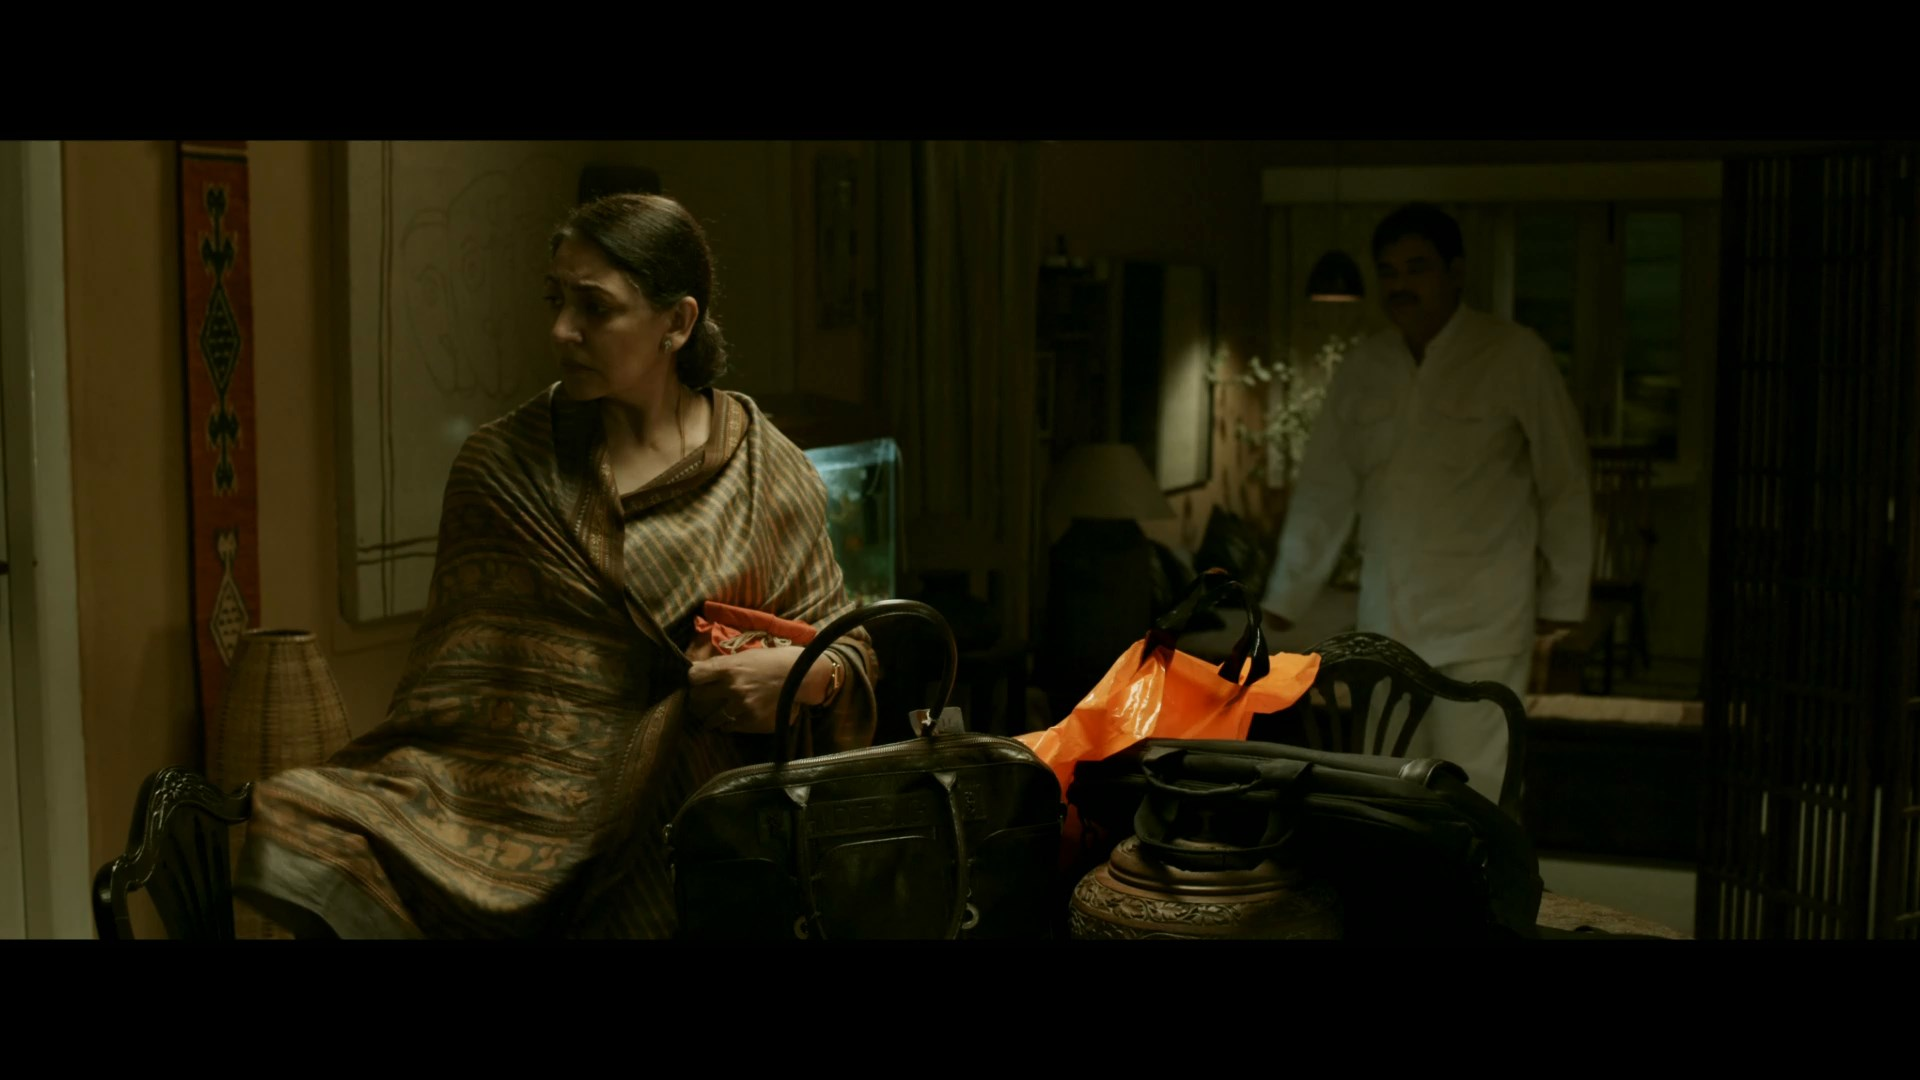 Memories in March (2020) Bengali 1080p WEB DL H264 AAC EvAn.mkv snapshot 00.13.26 [2020.06.05 06.12.